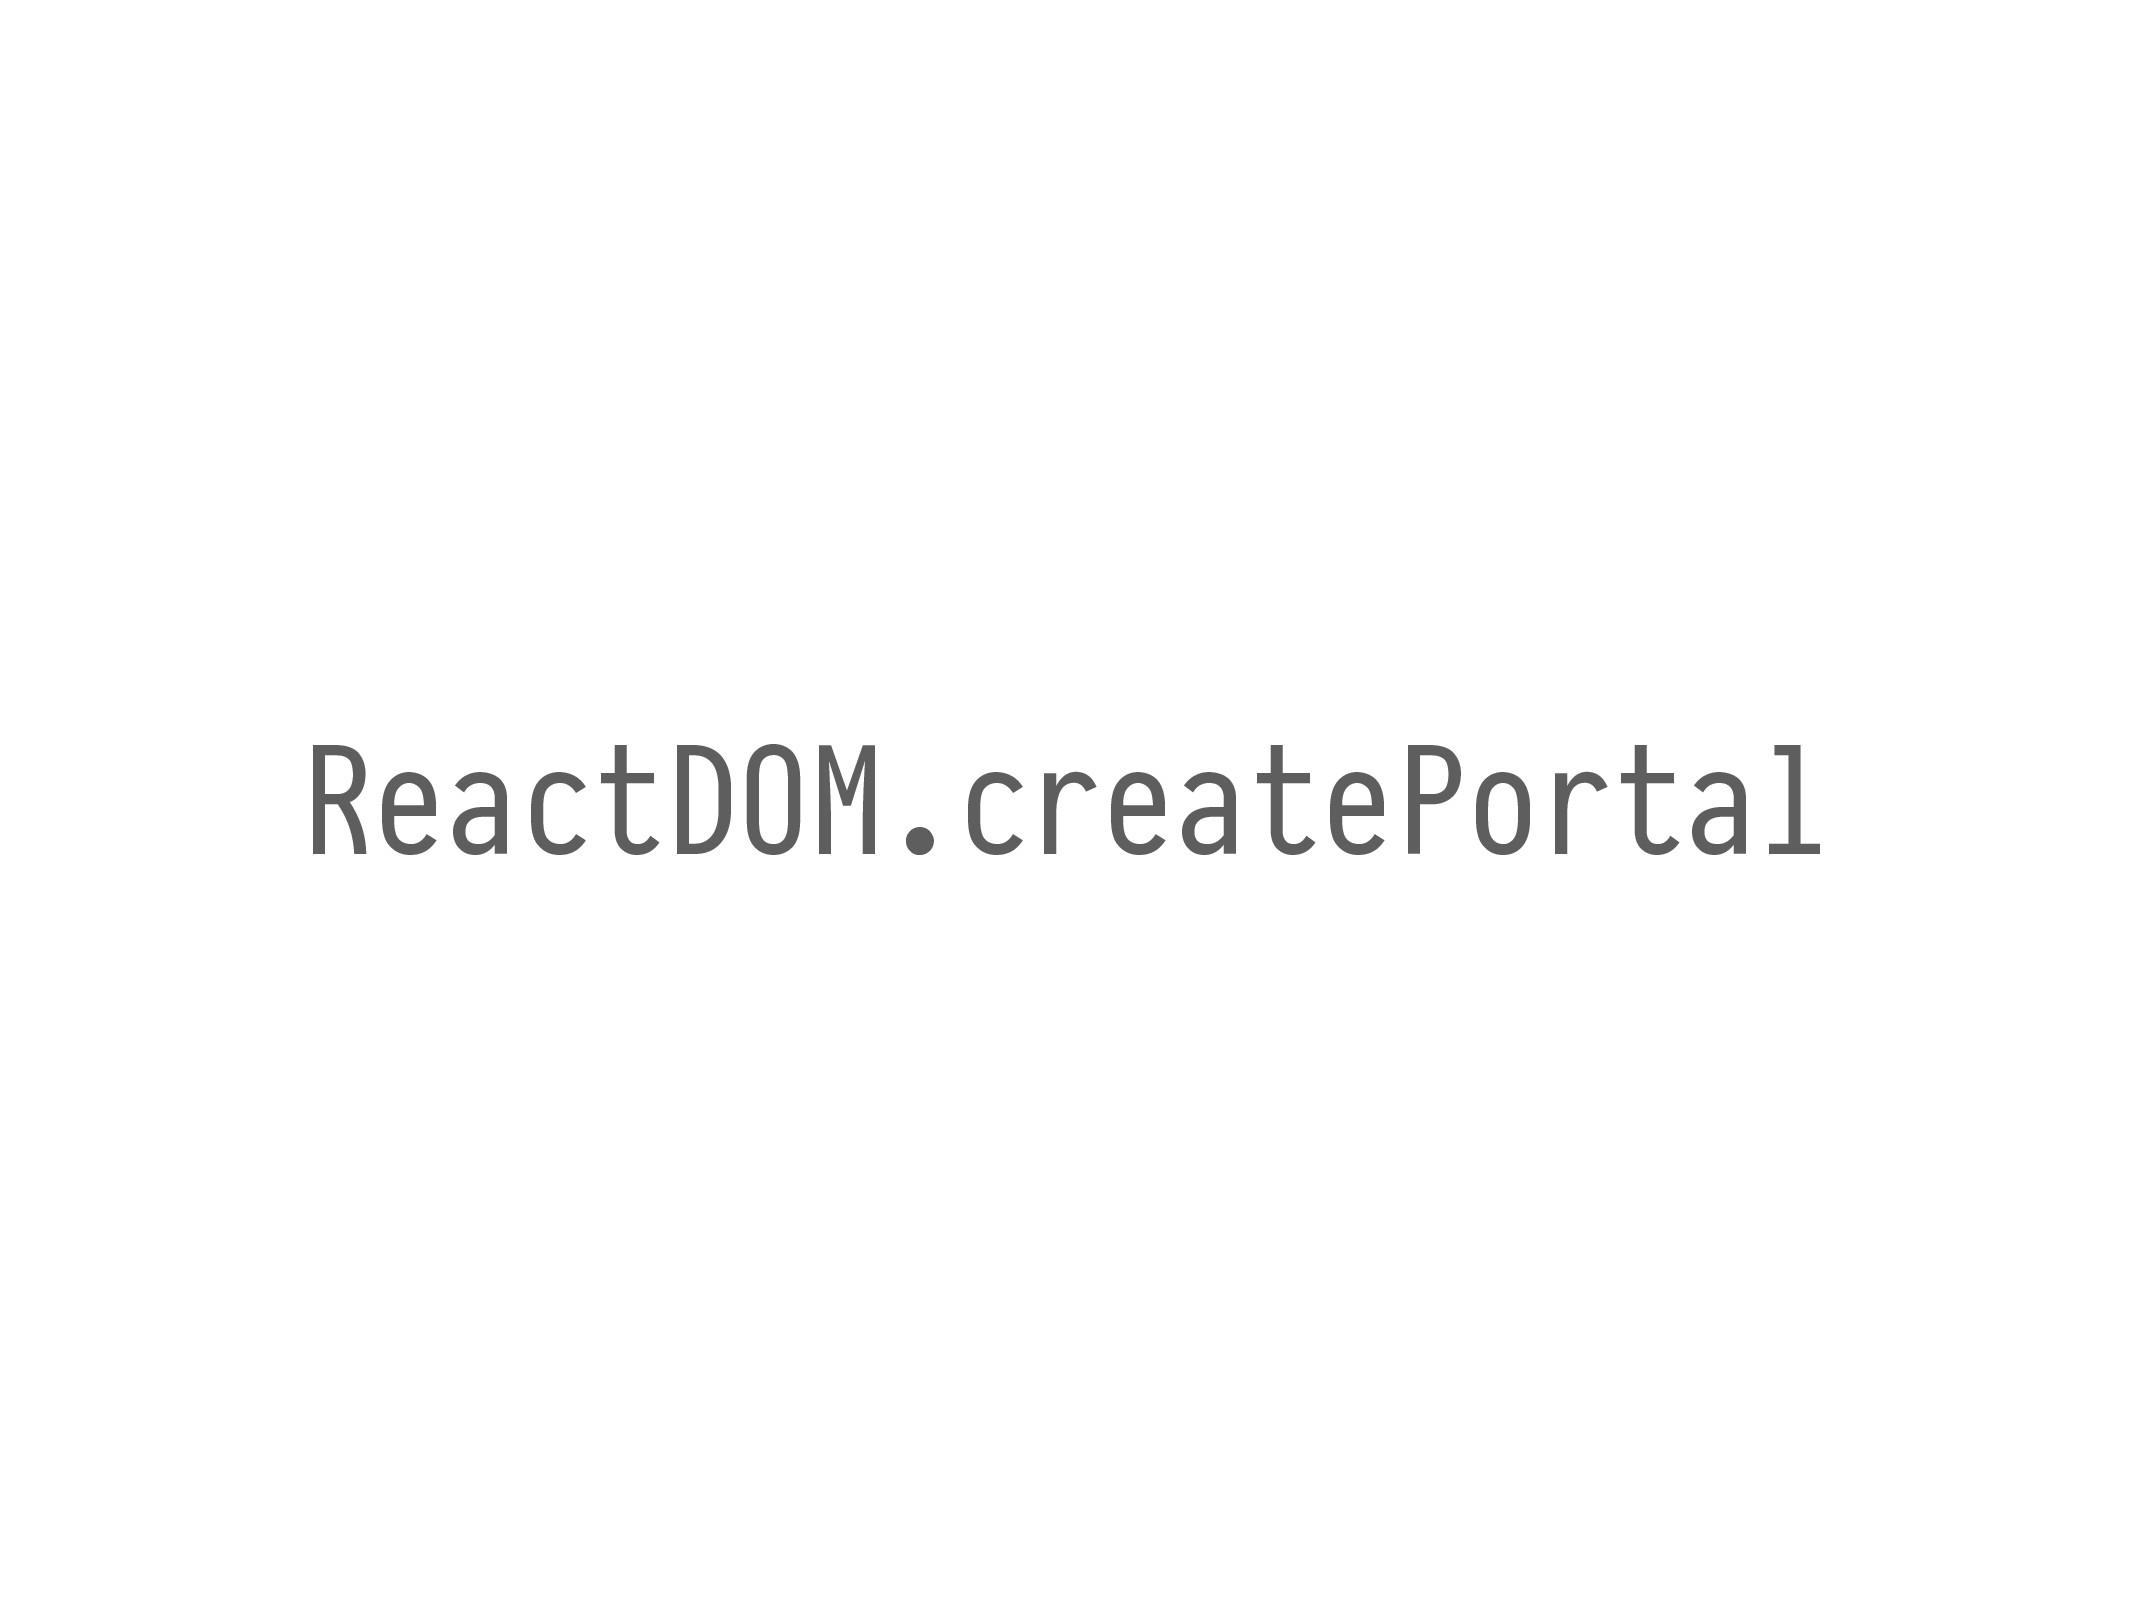 ReactDOM.createPortal